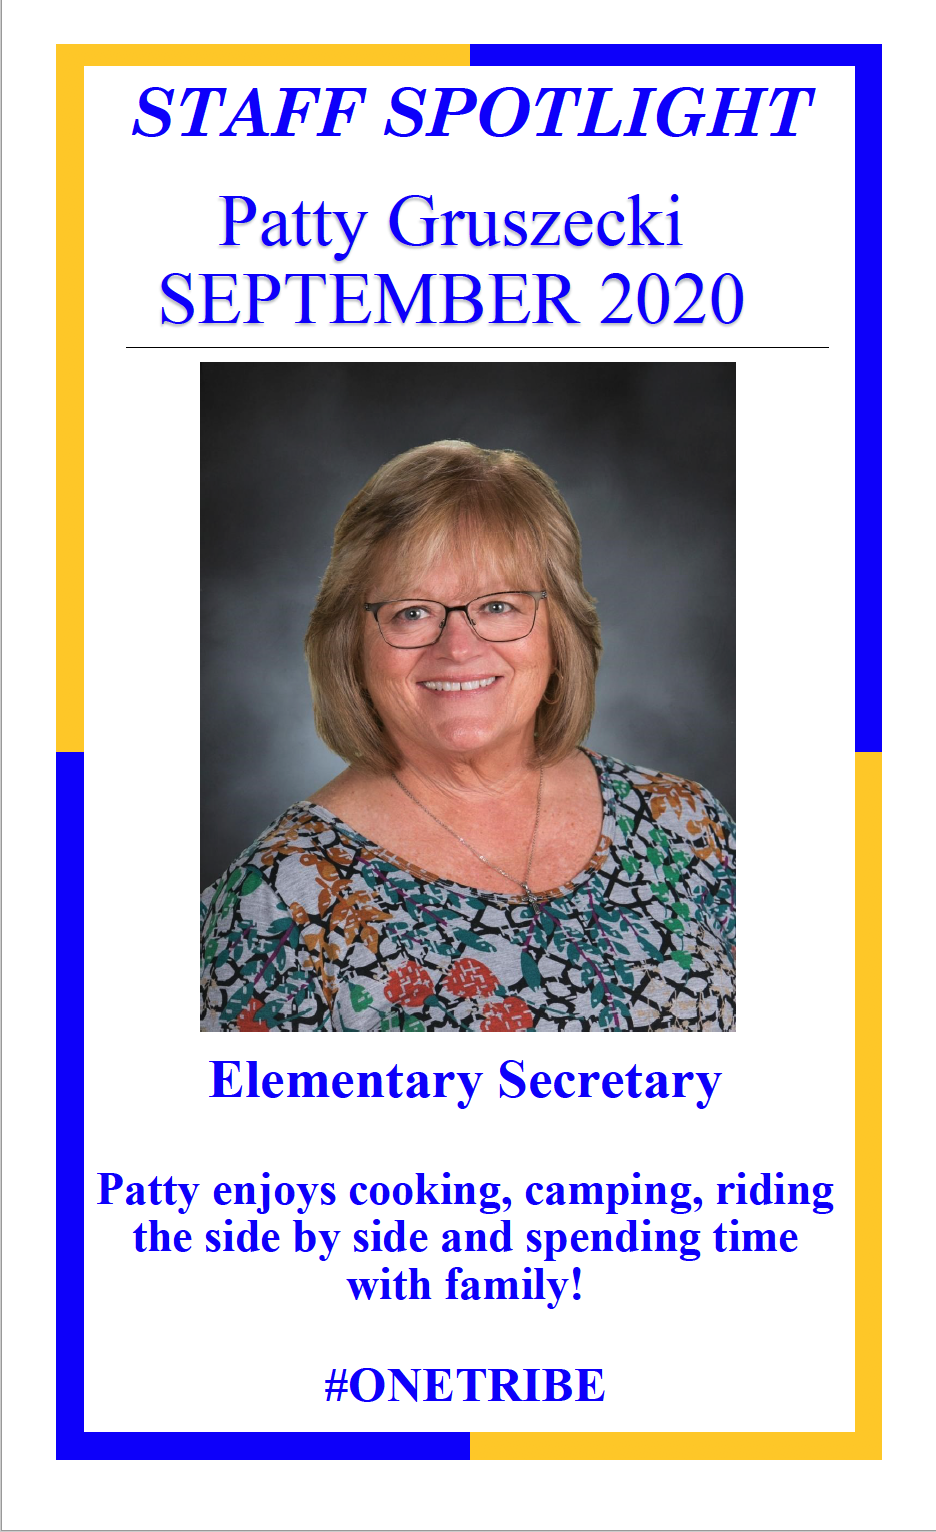 Grusezecki, Sept. 2020 Staff Spotlight